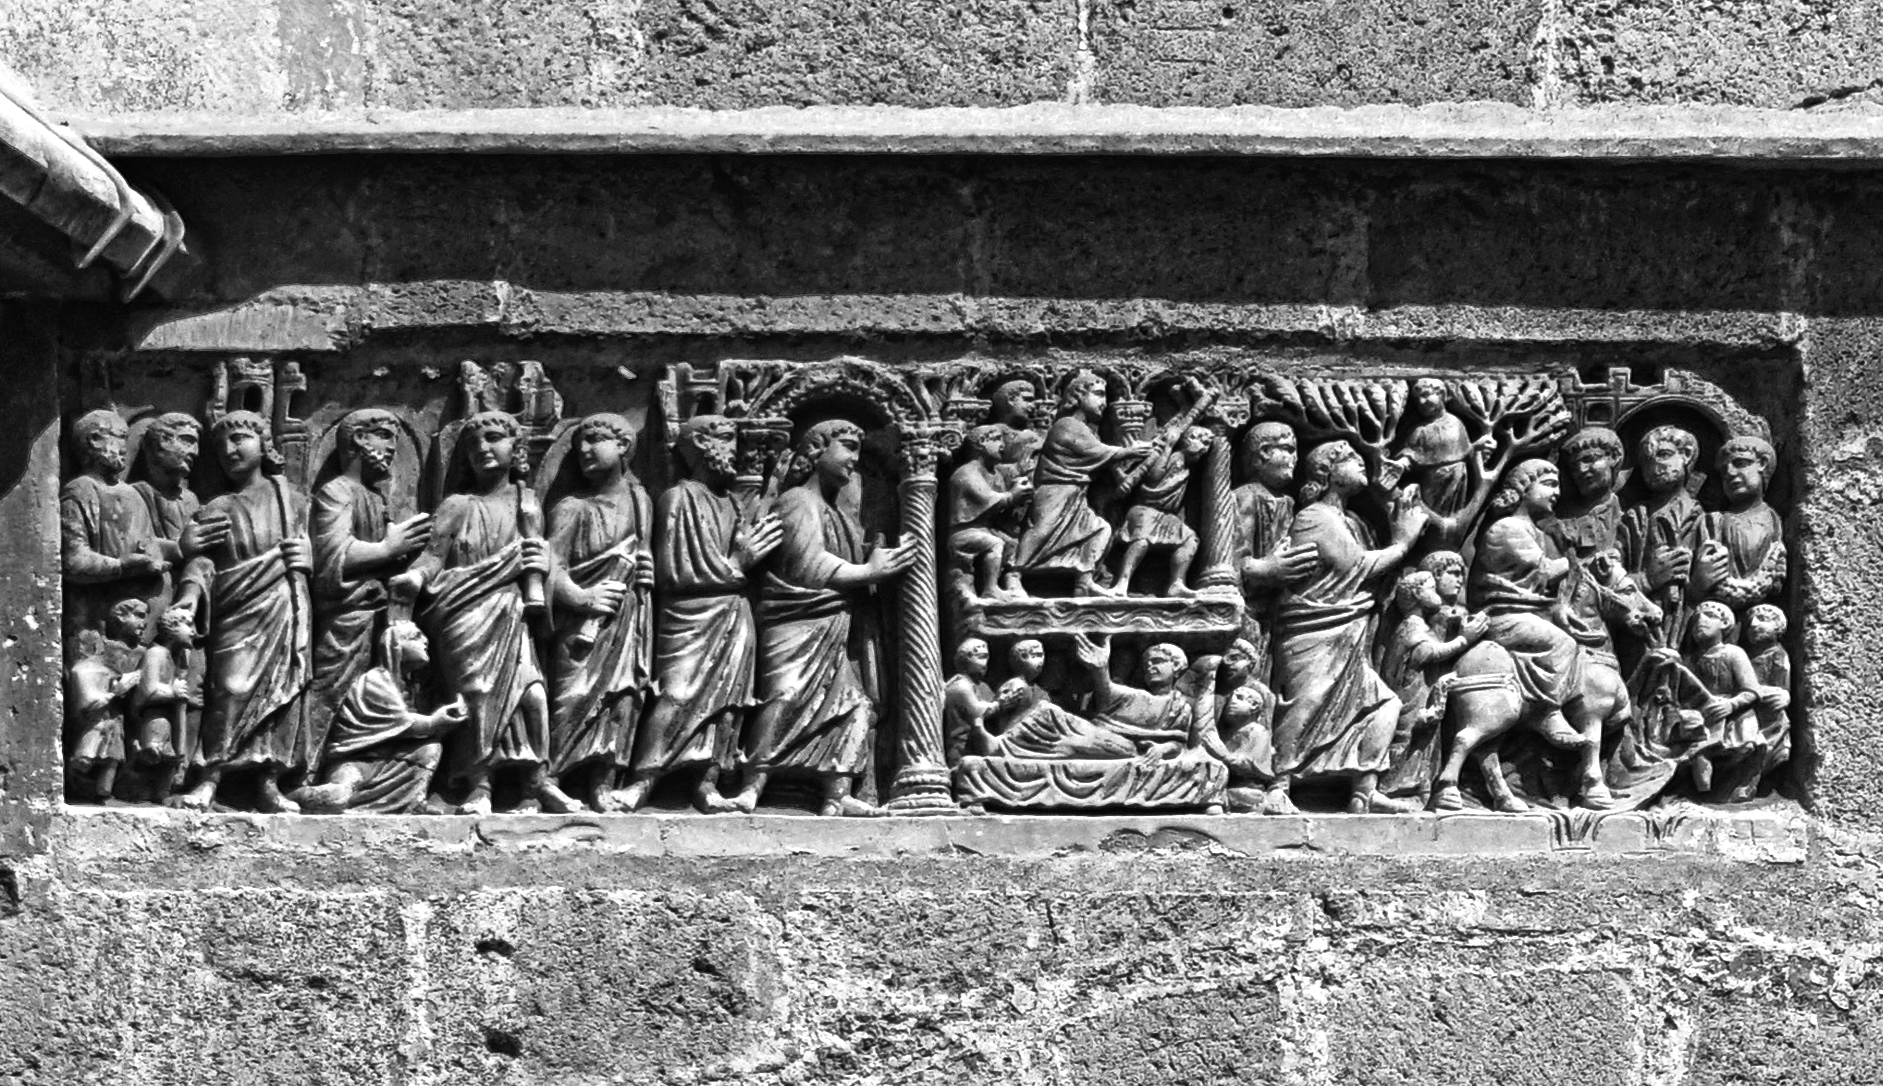 El sarcòfag de Bethesda de la Catedral de Tarragona